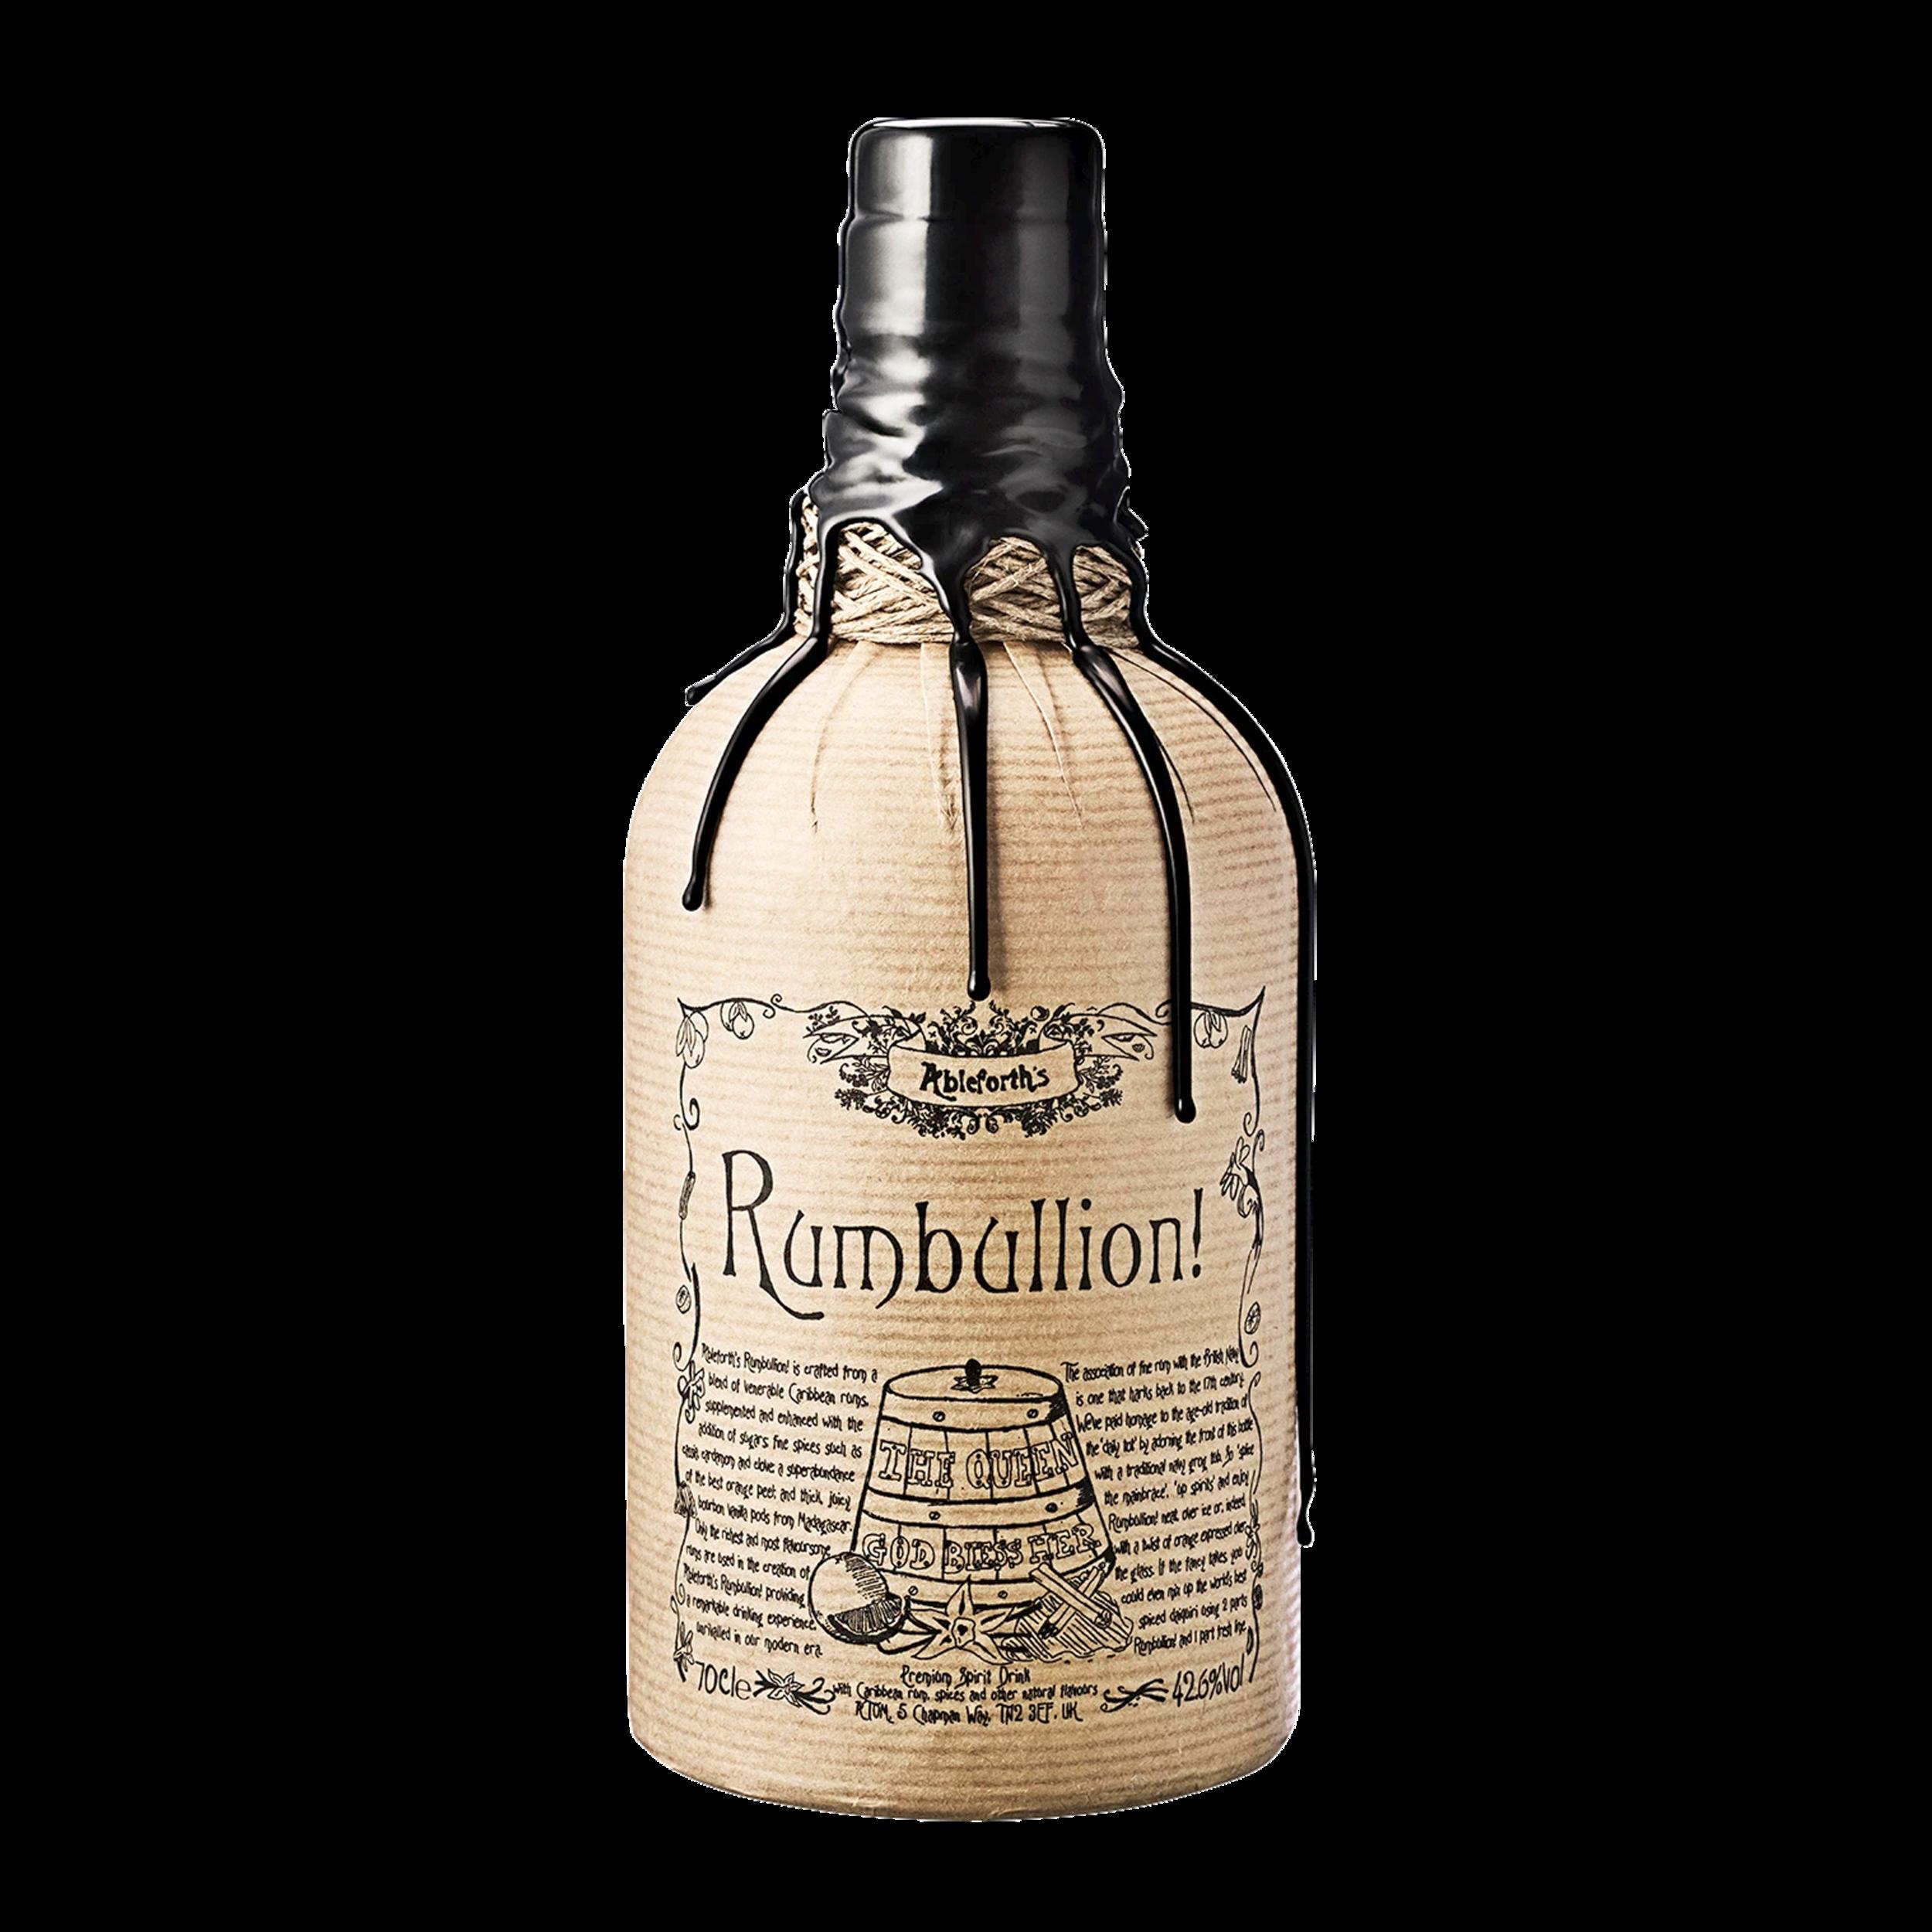 Rhum - Rumbullion - Angleterre - 42,6° - 70cl